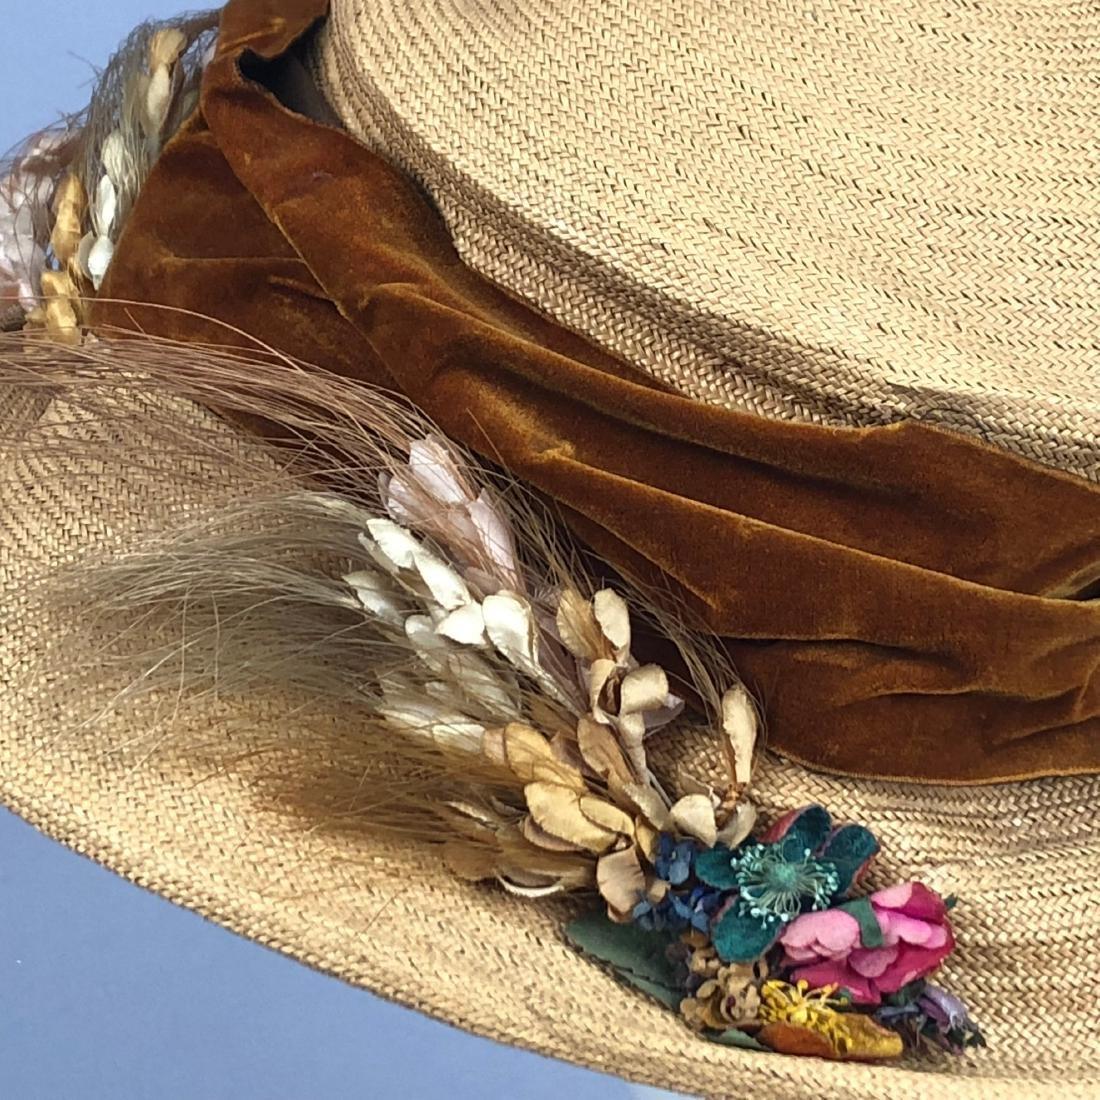 TWO WIDE-BRIM STRAW HATS, 1905 - 1915 - 6